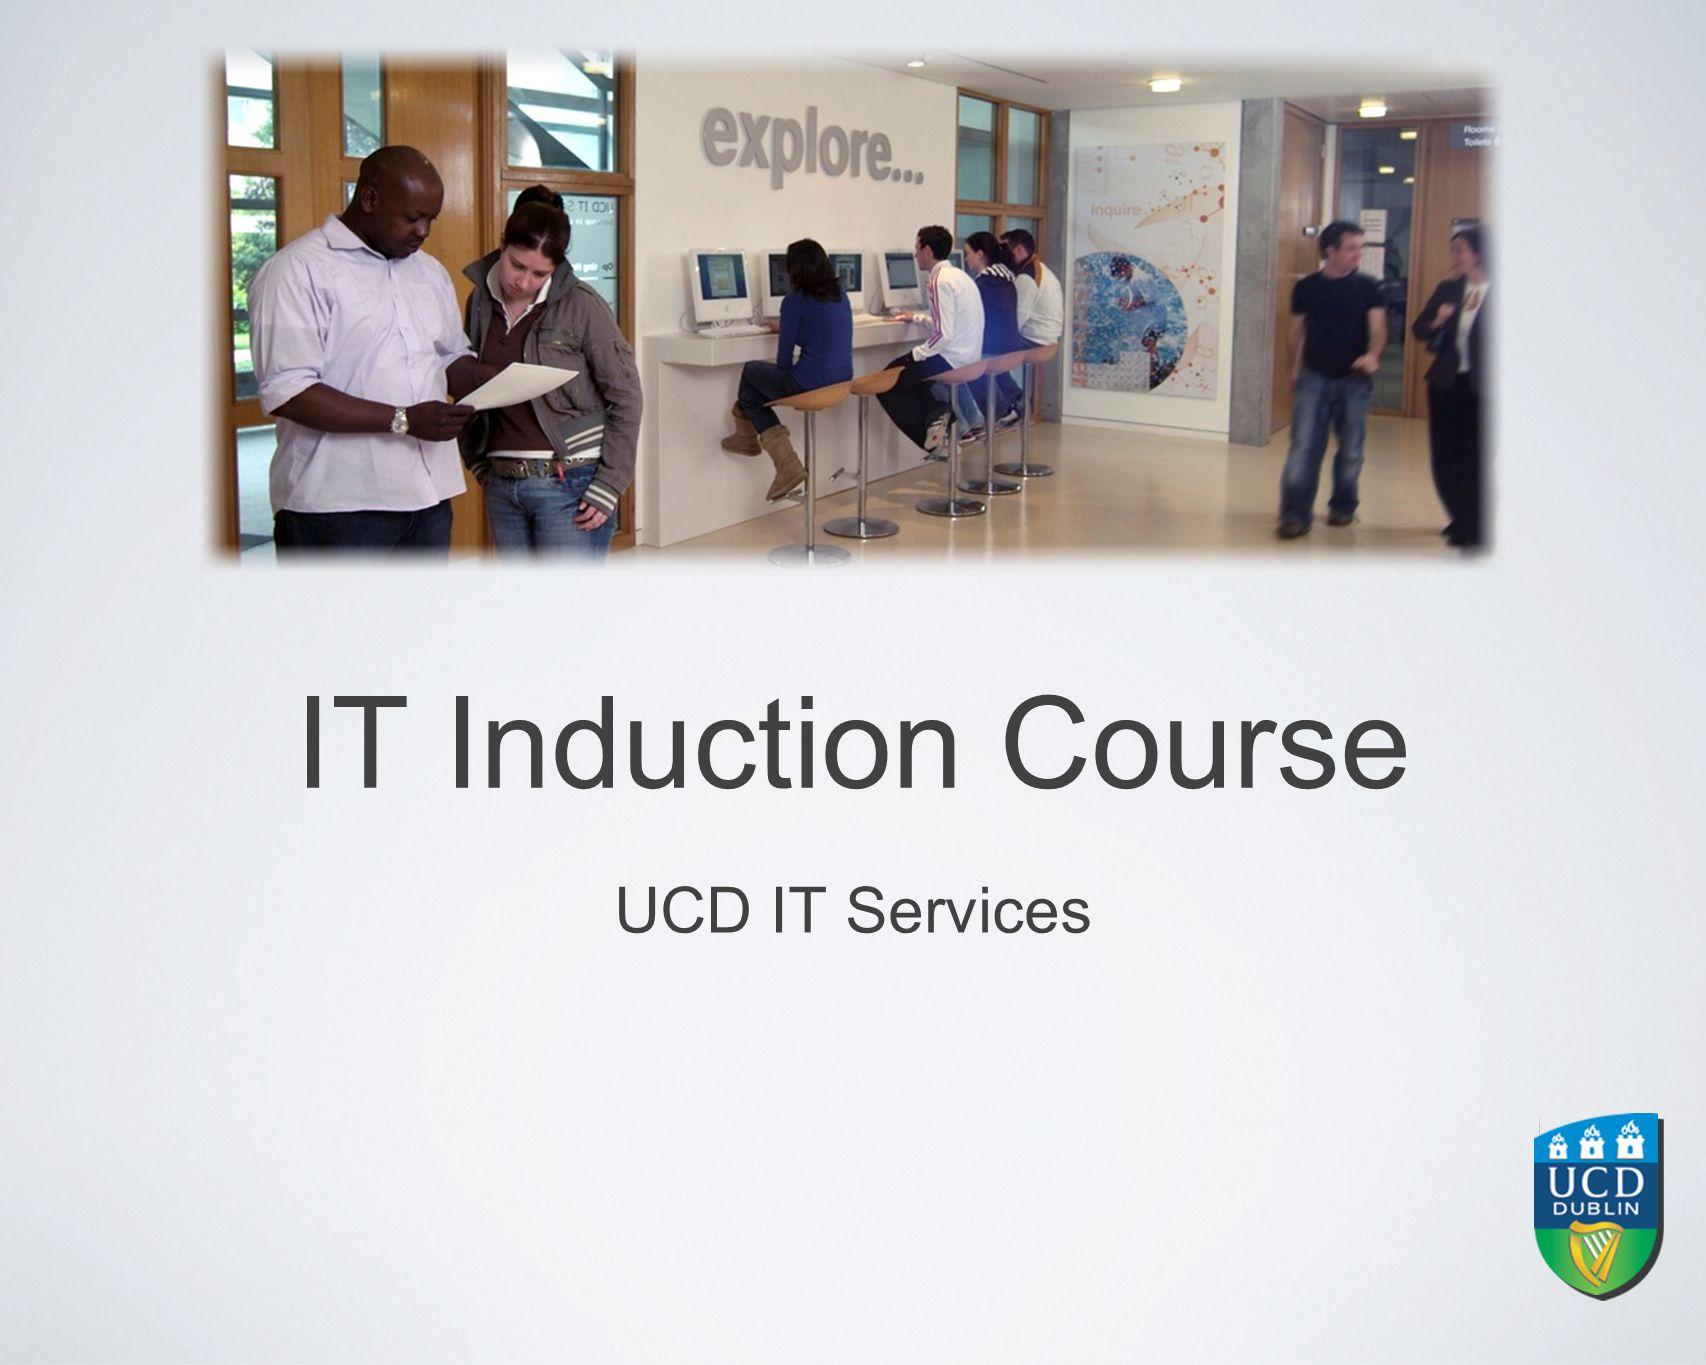 IT Induction Course UCD IT Services